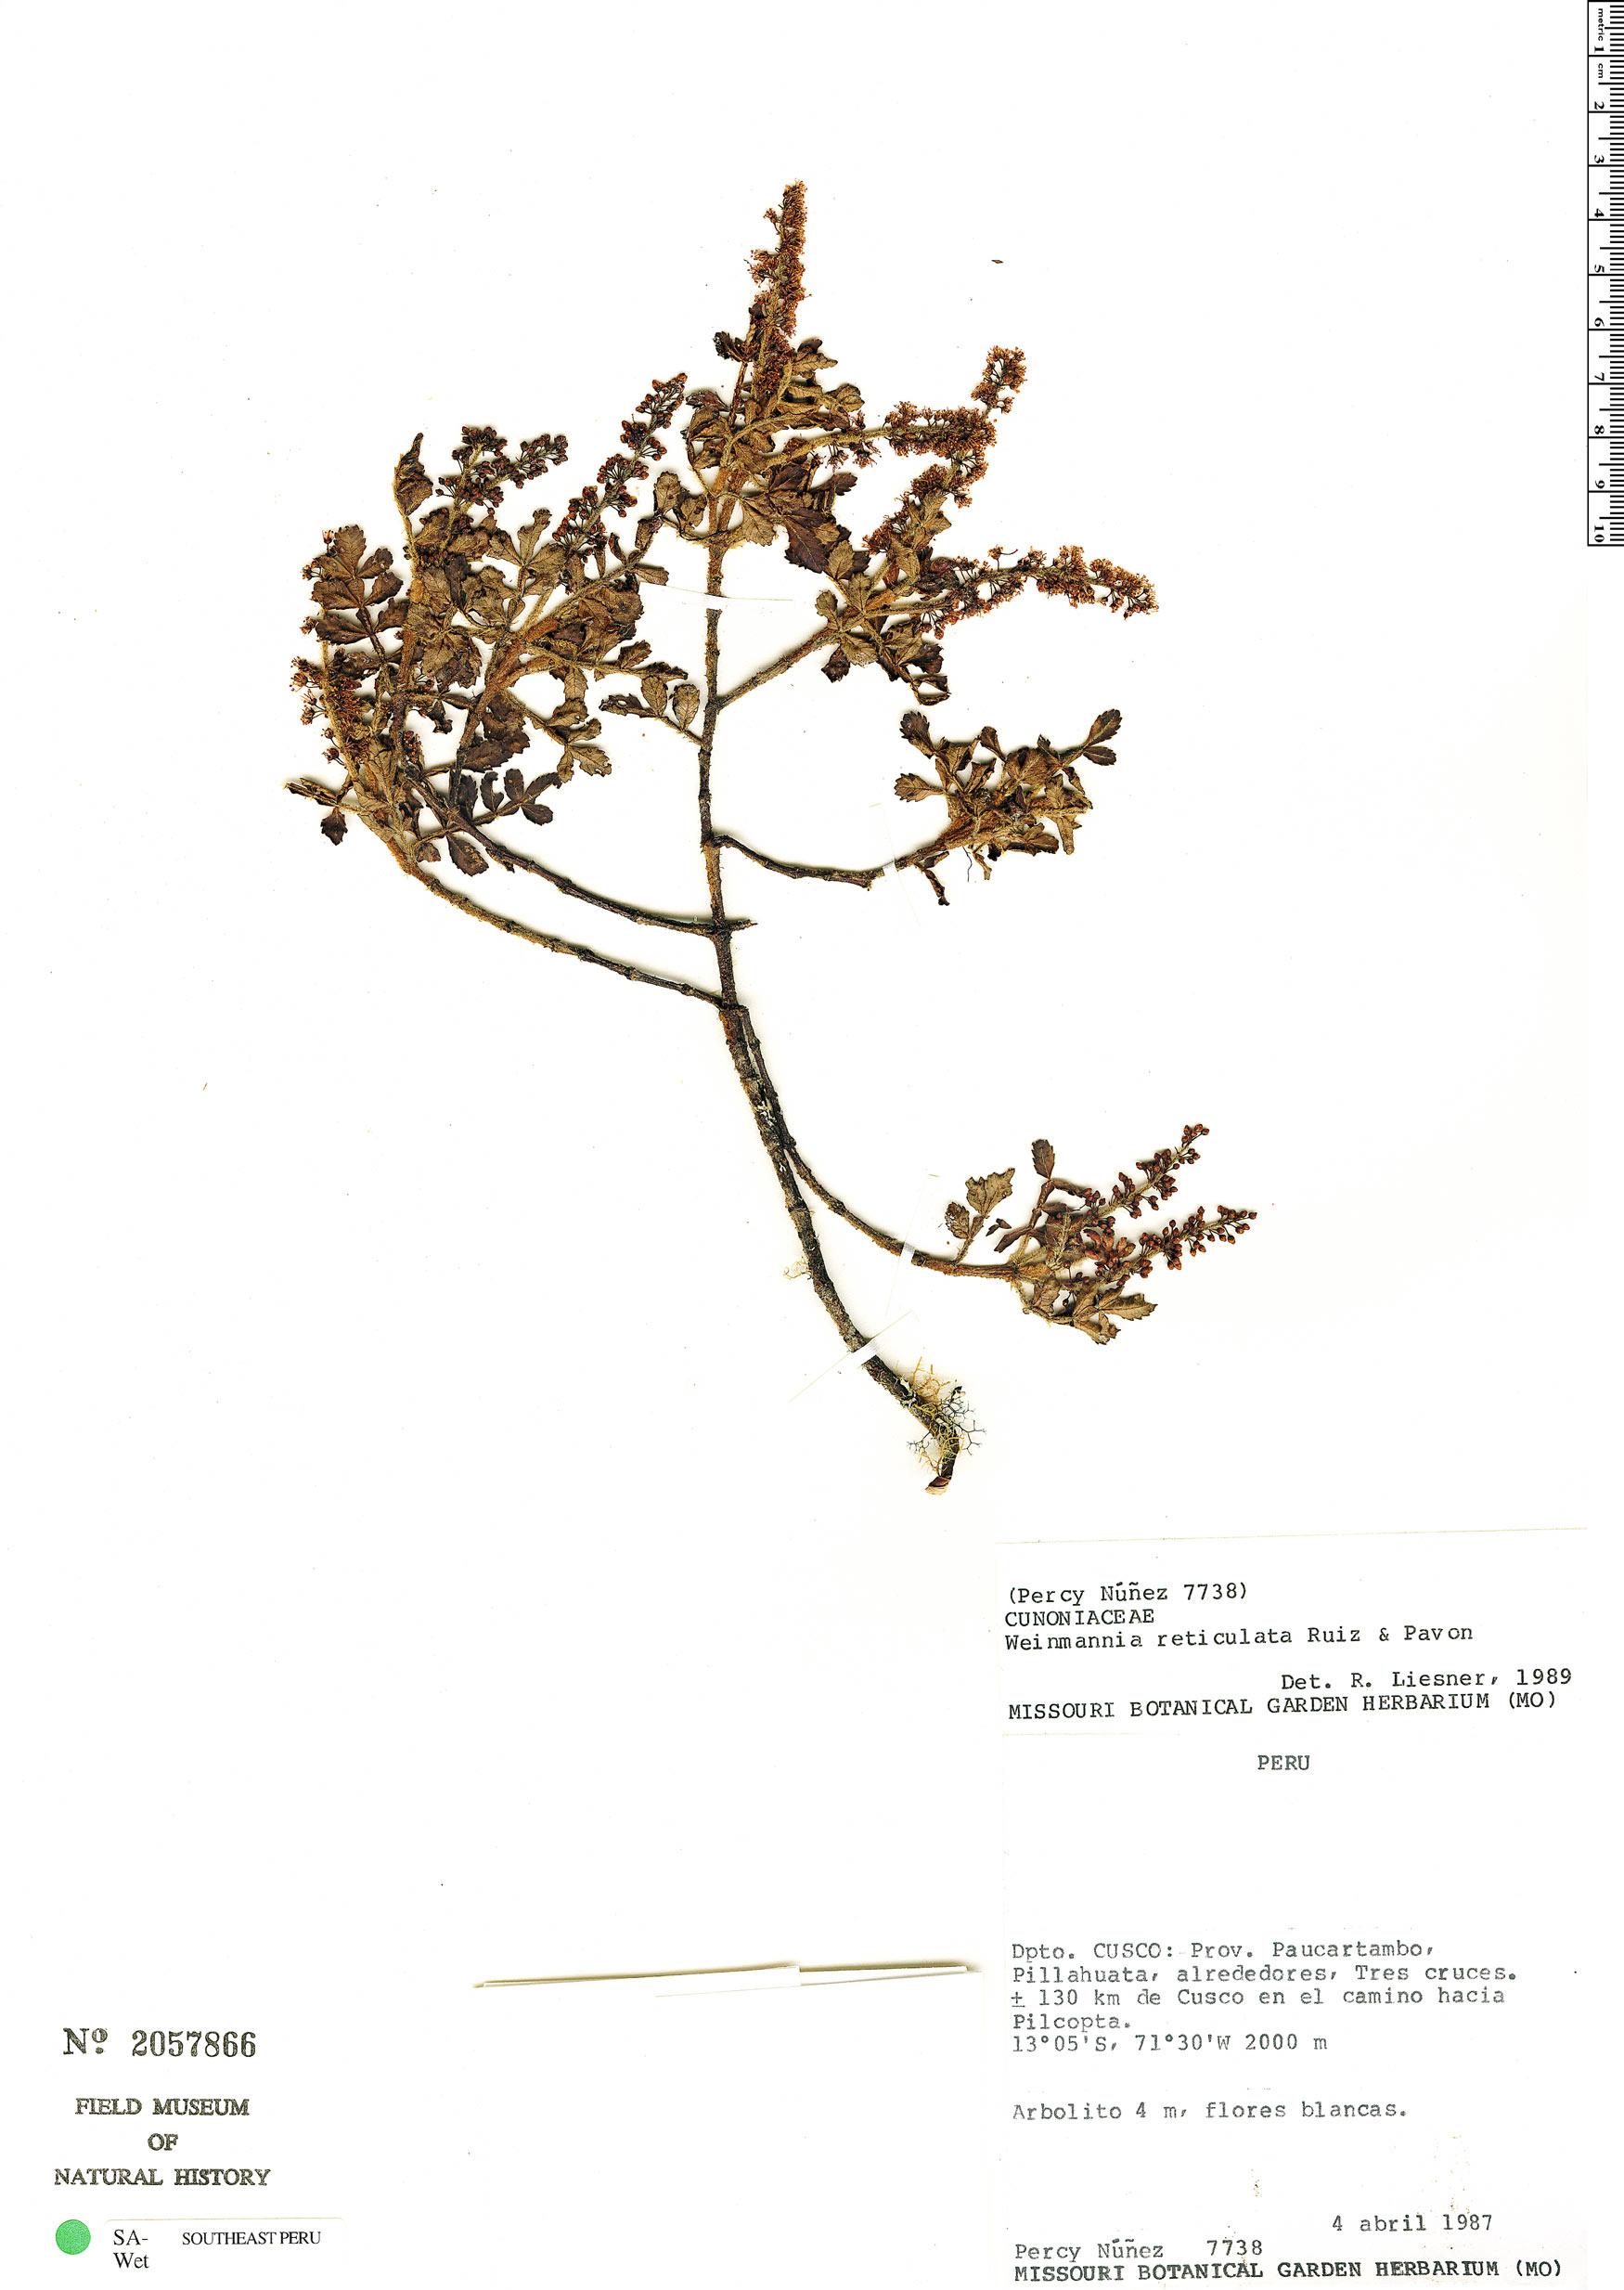 Specimen: Weinmannia reticulata